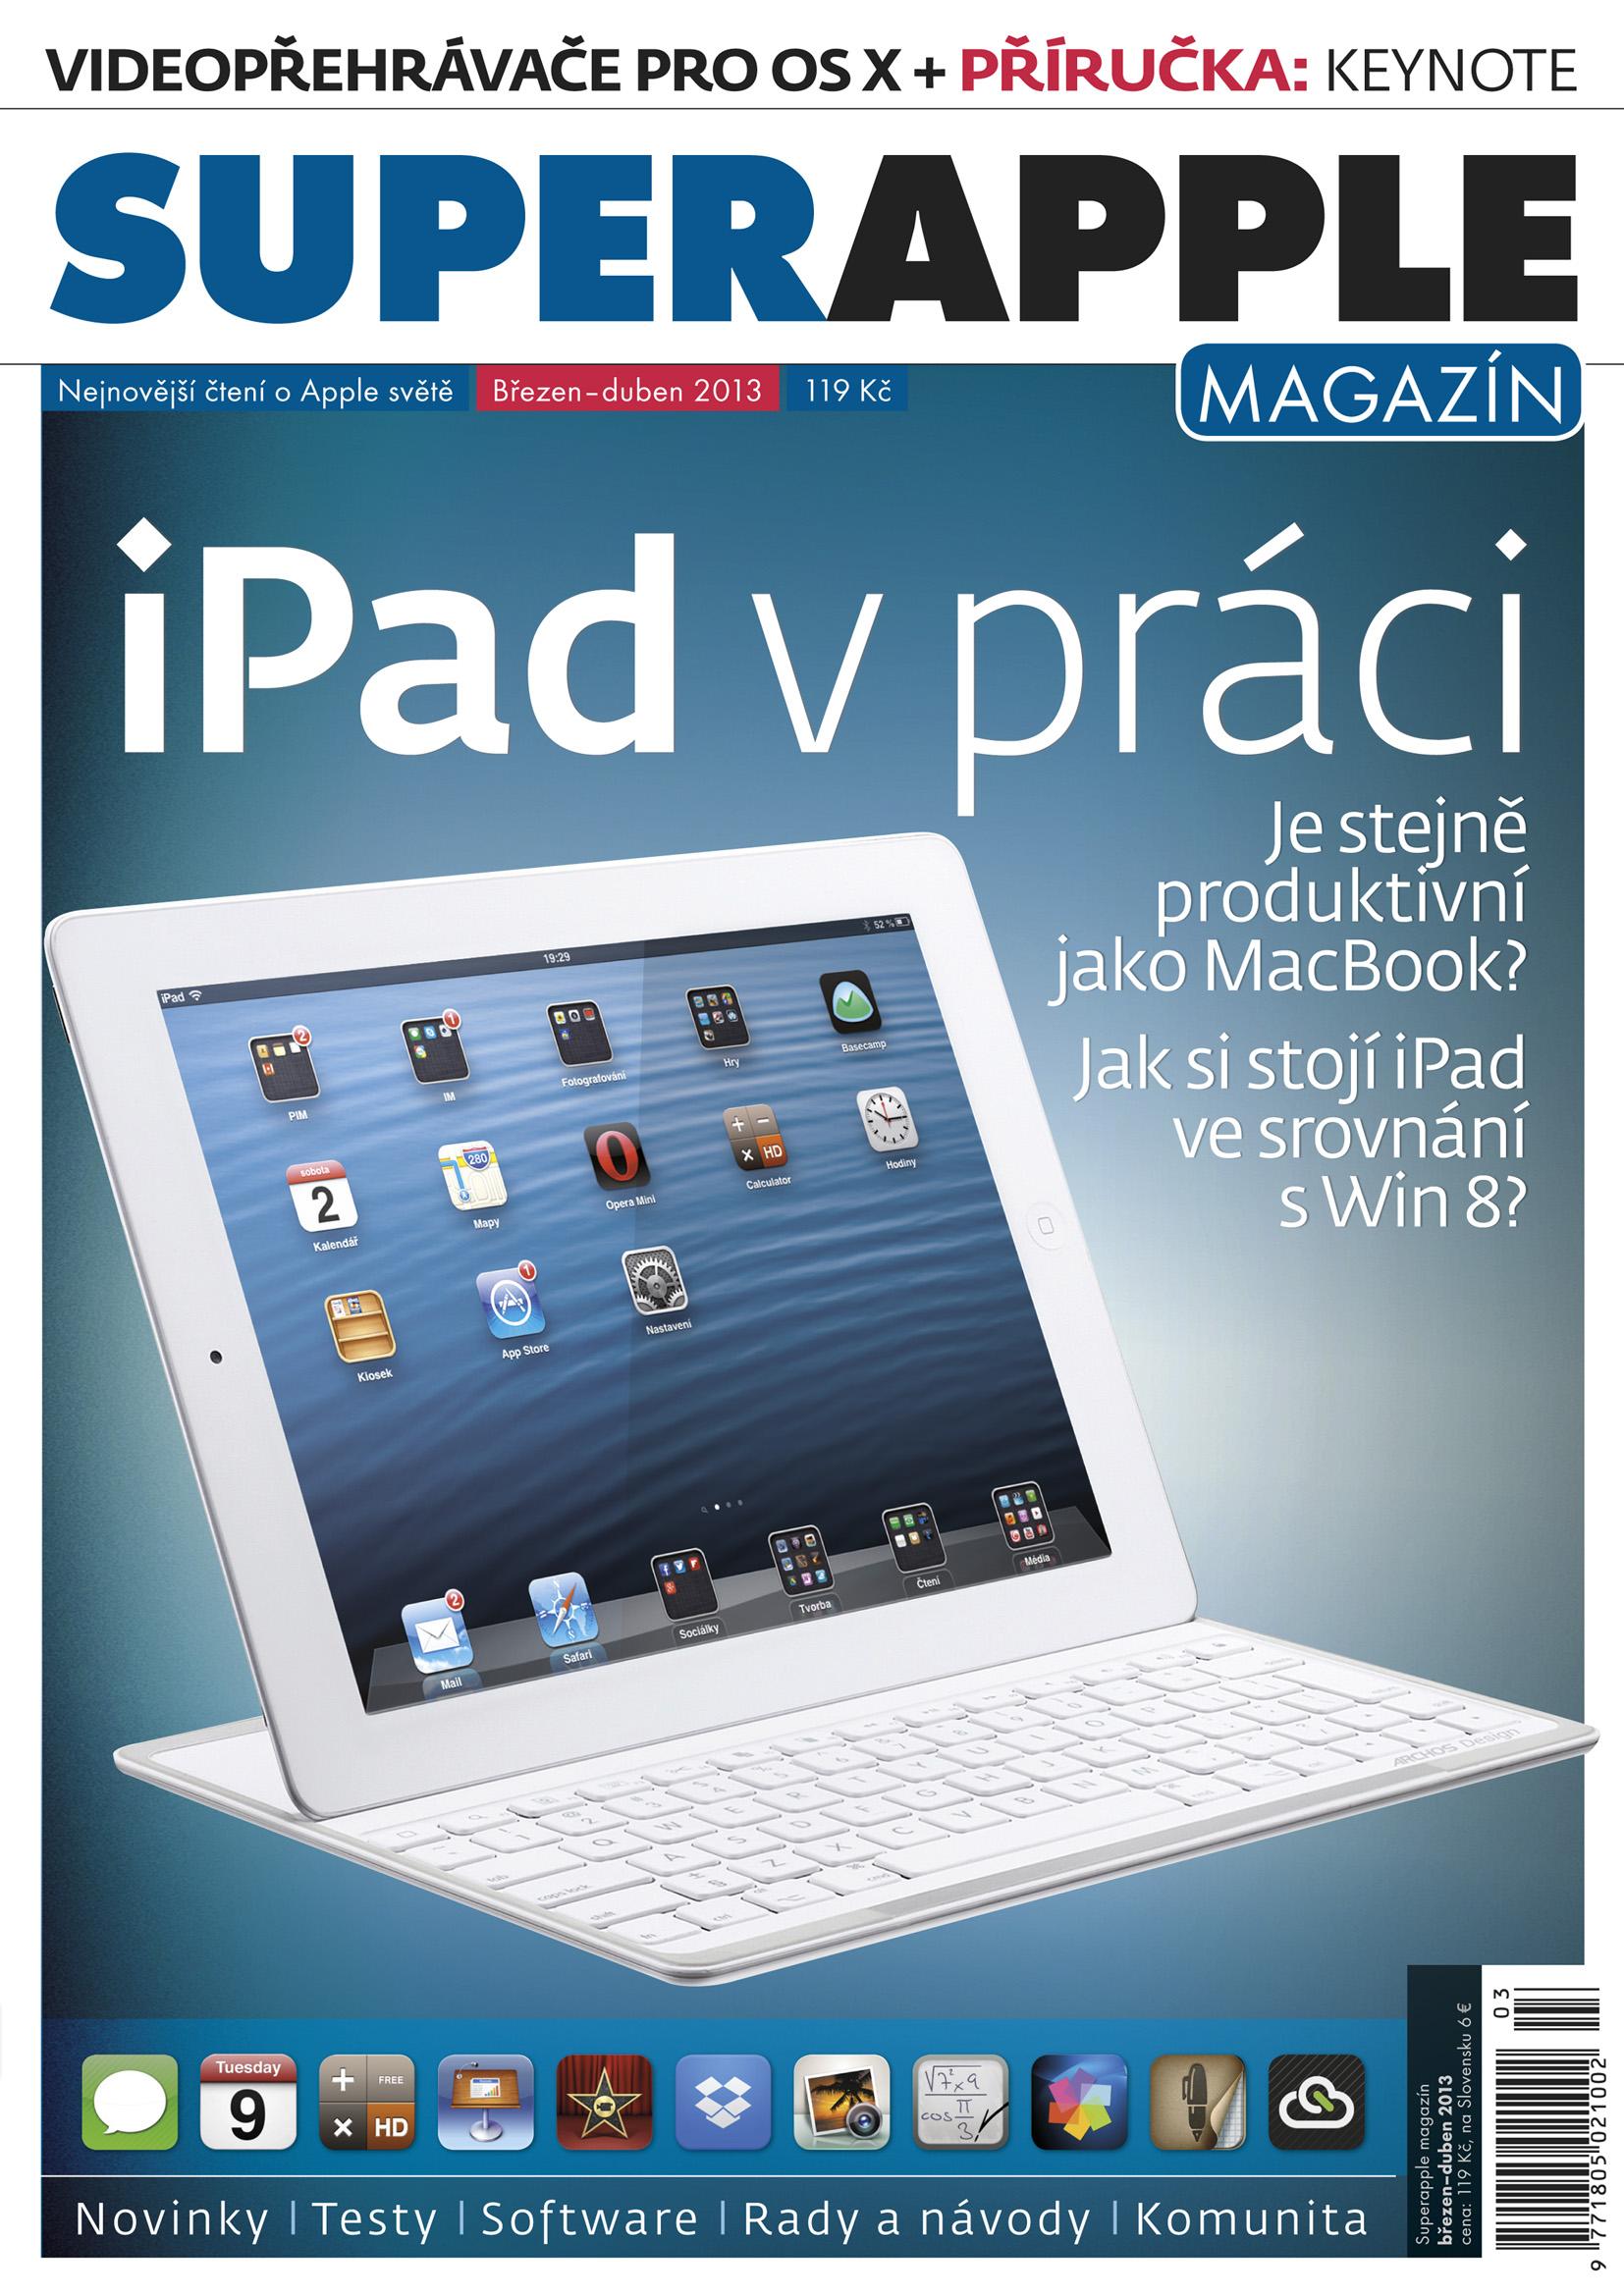 SA_magazine_titul_2013_03_04.indd